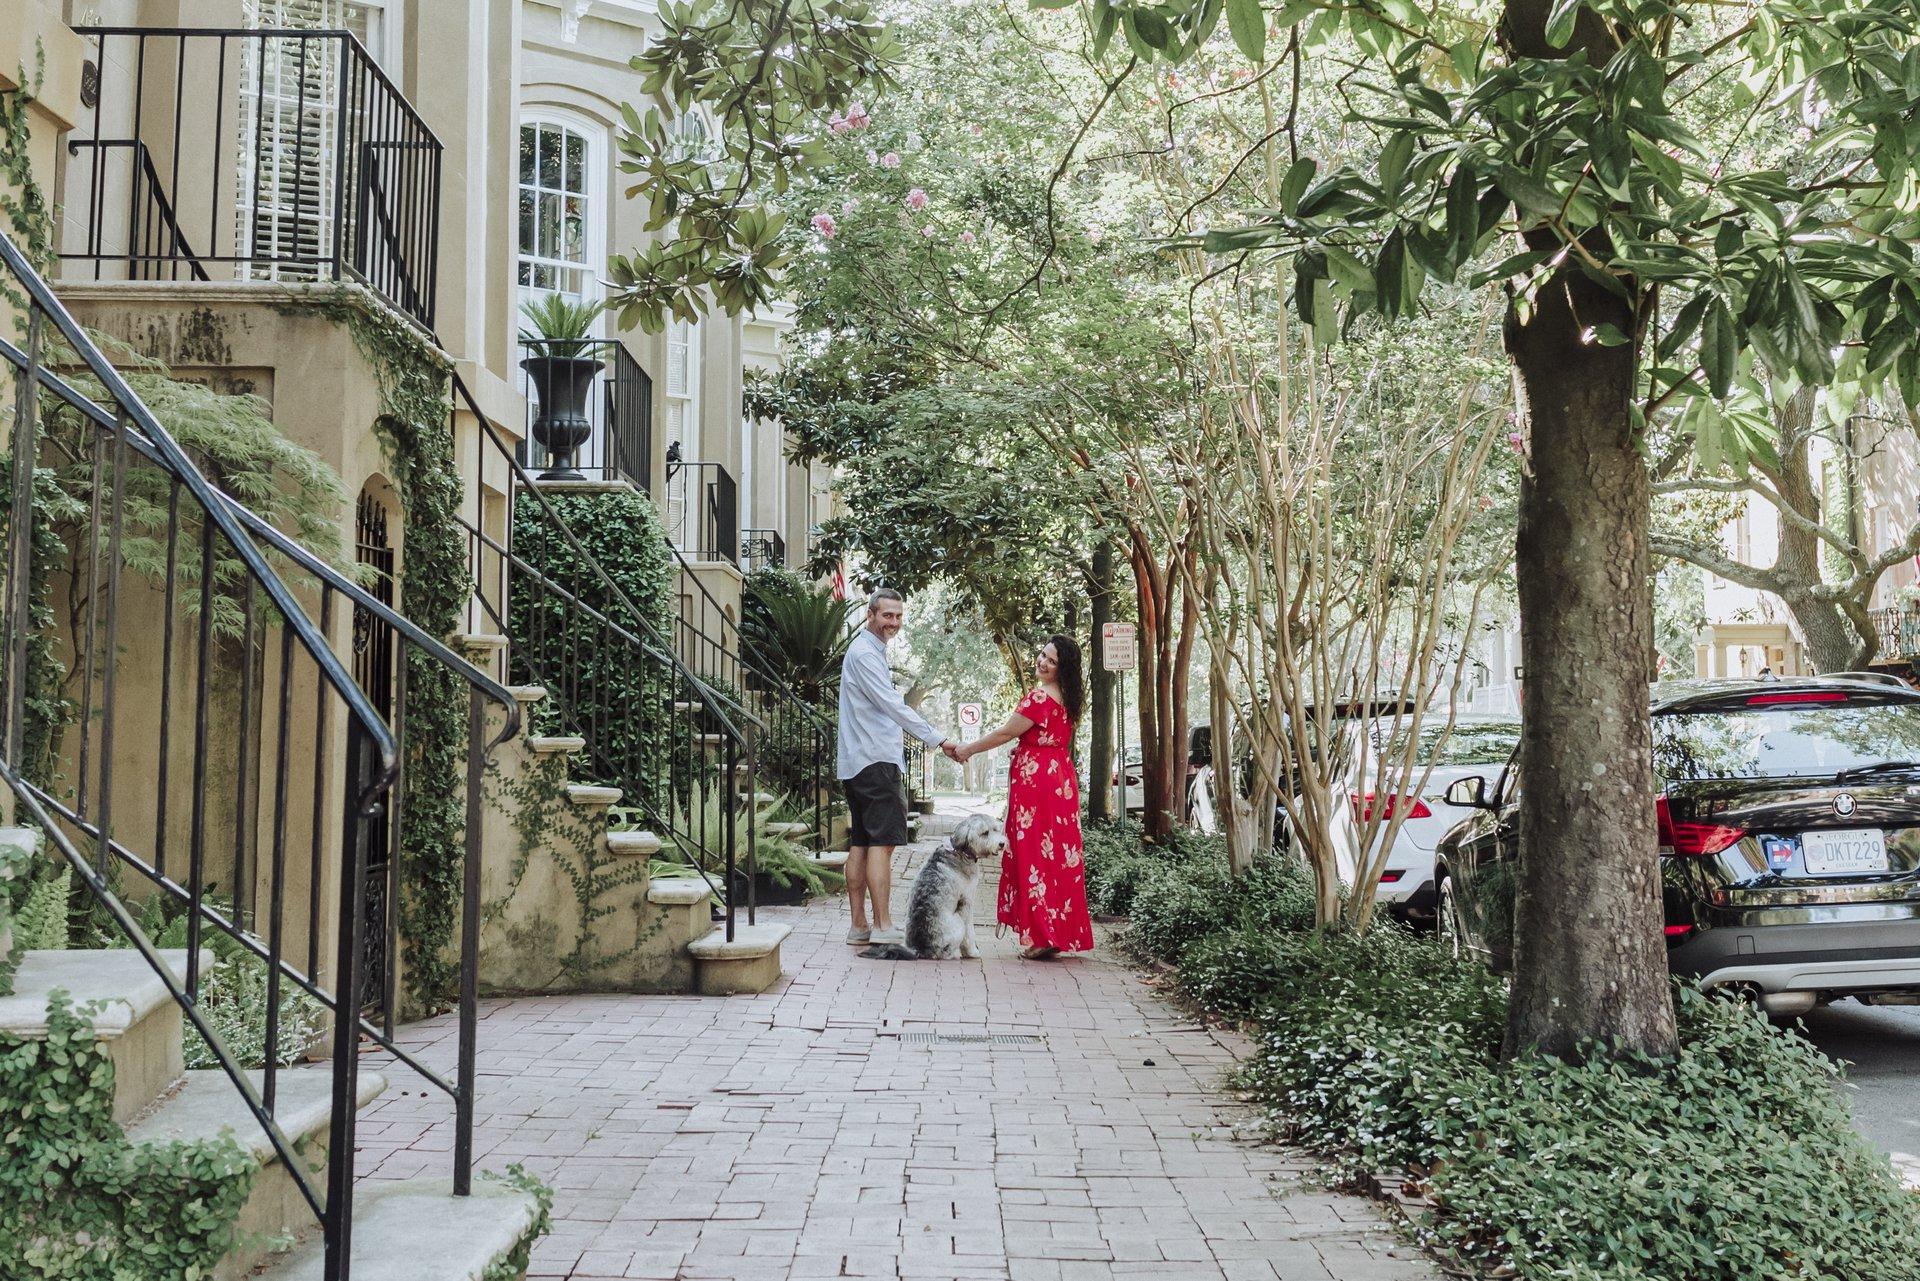 Savannah-United States-travel-story-Flytographer-4